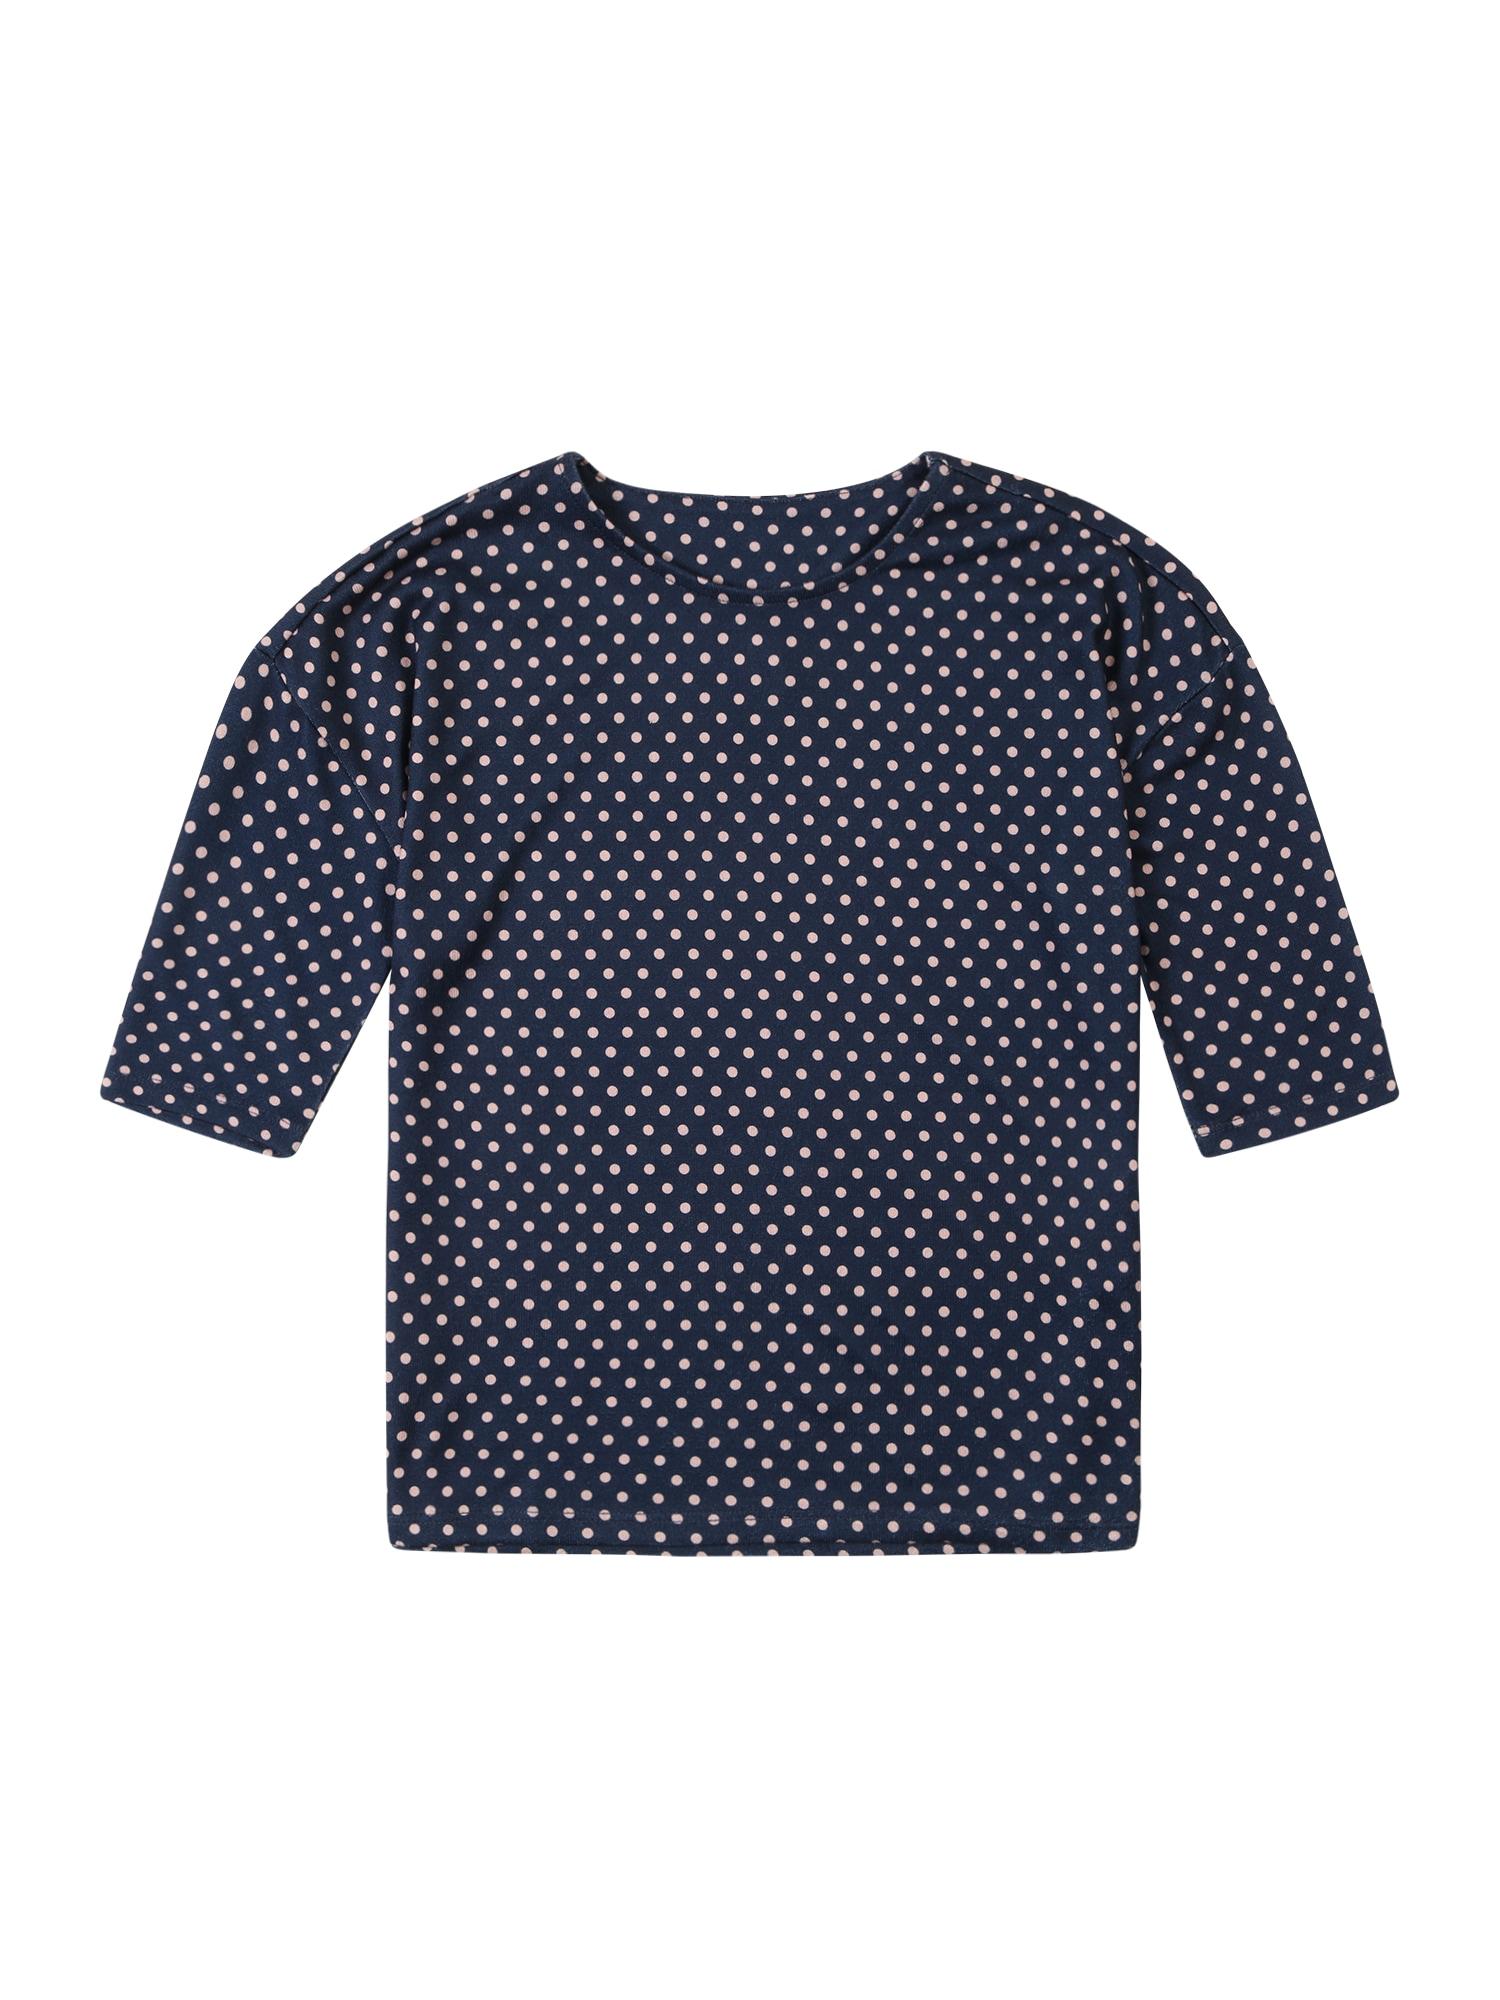 Tričko KIKI ELCOS tmavě modrá bílá KIDS ONLY